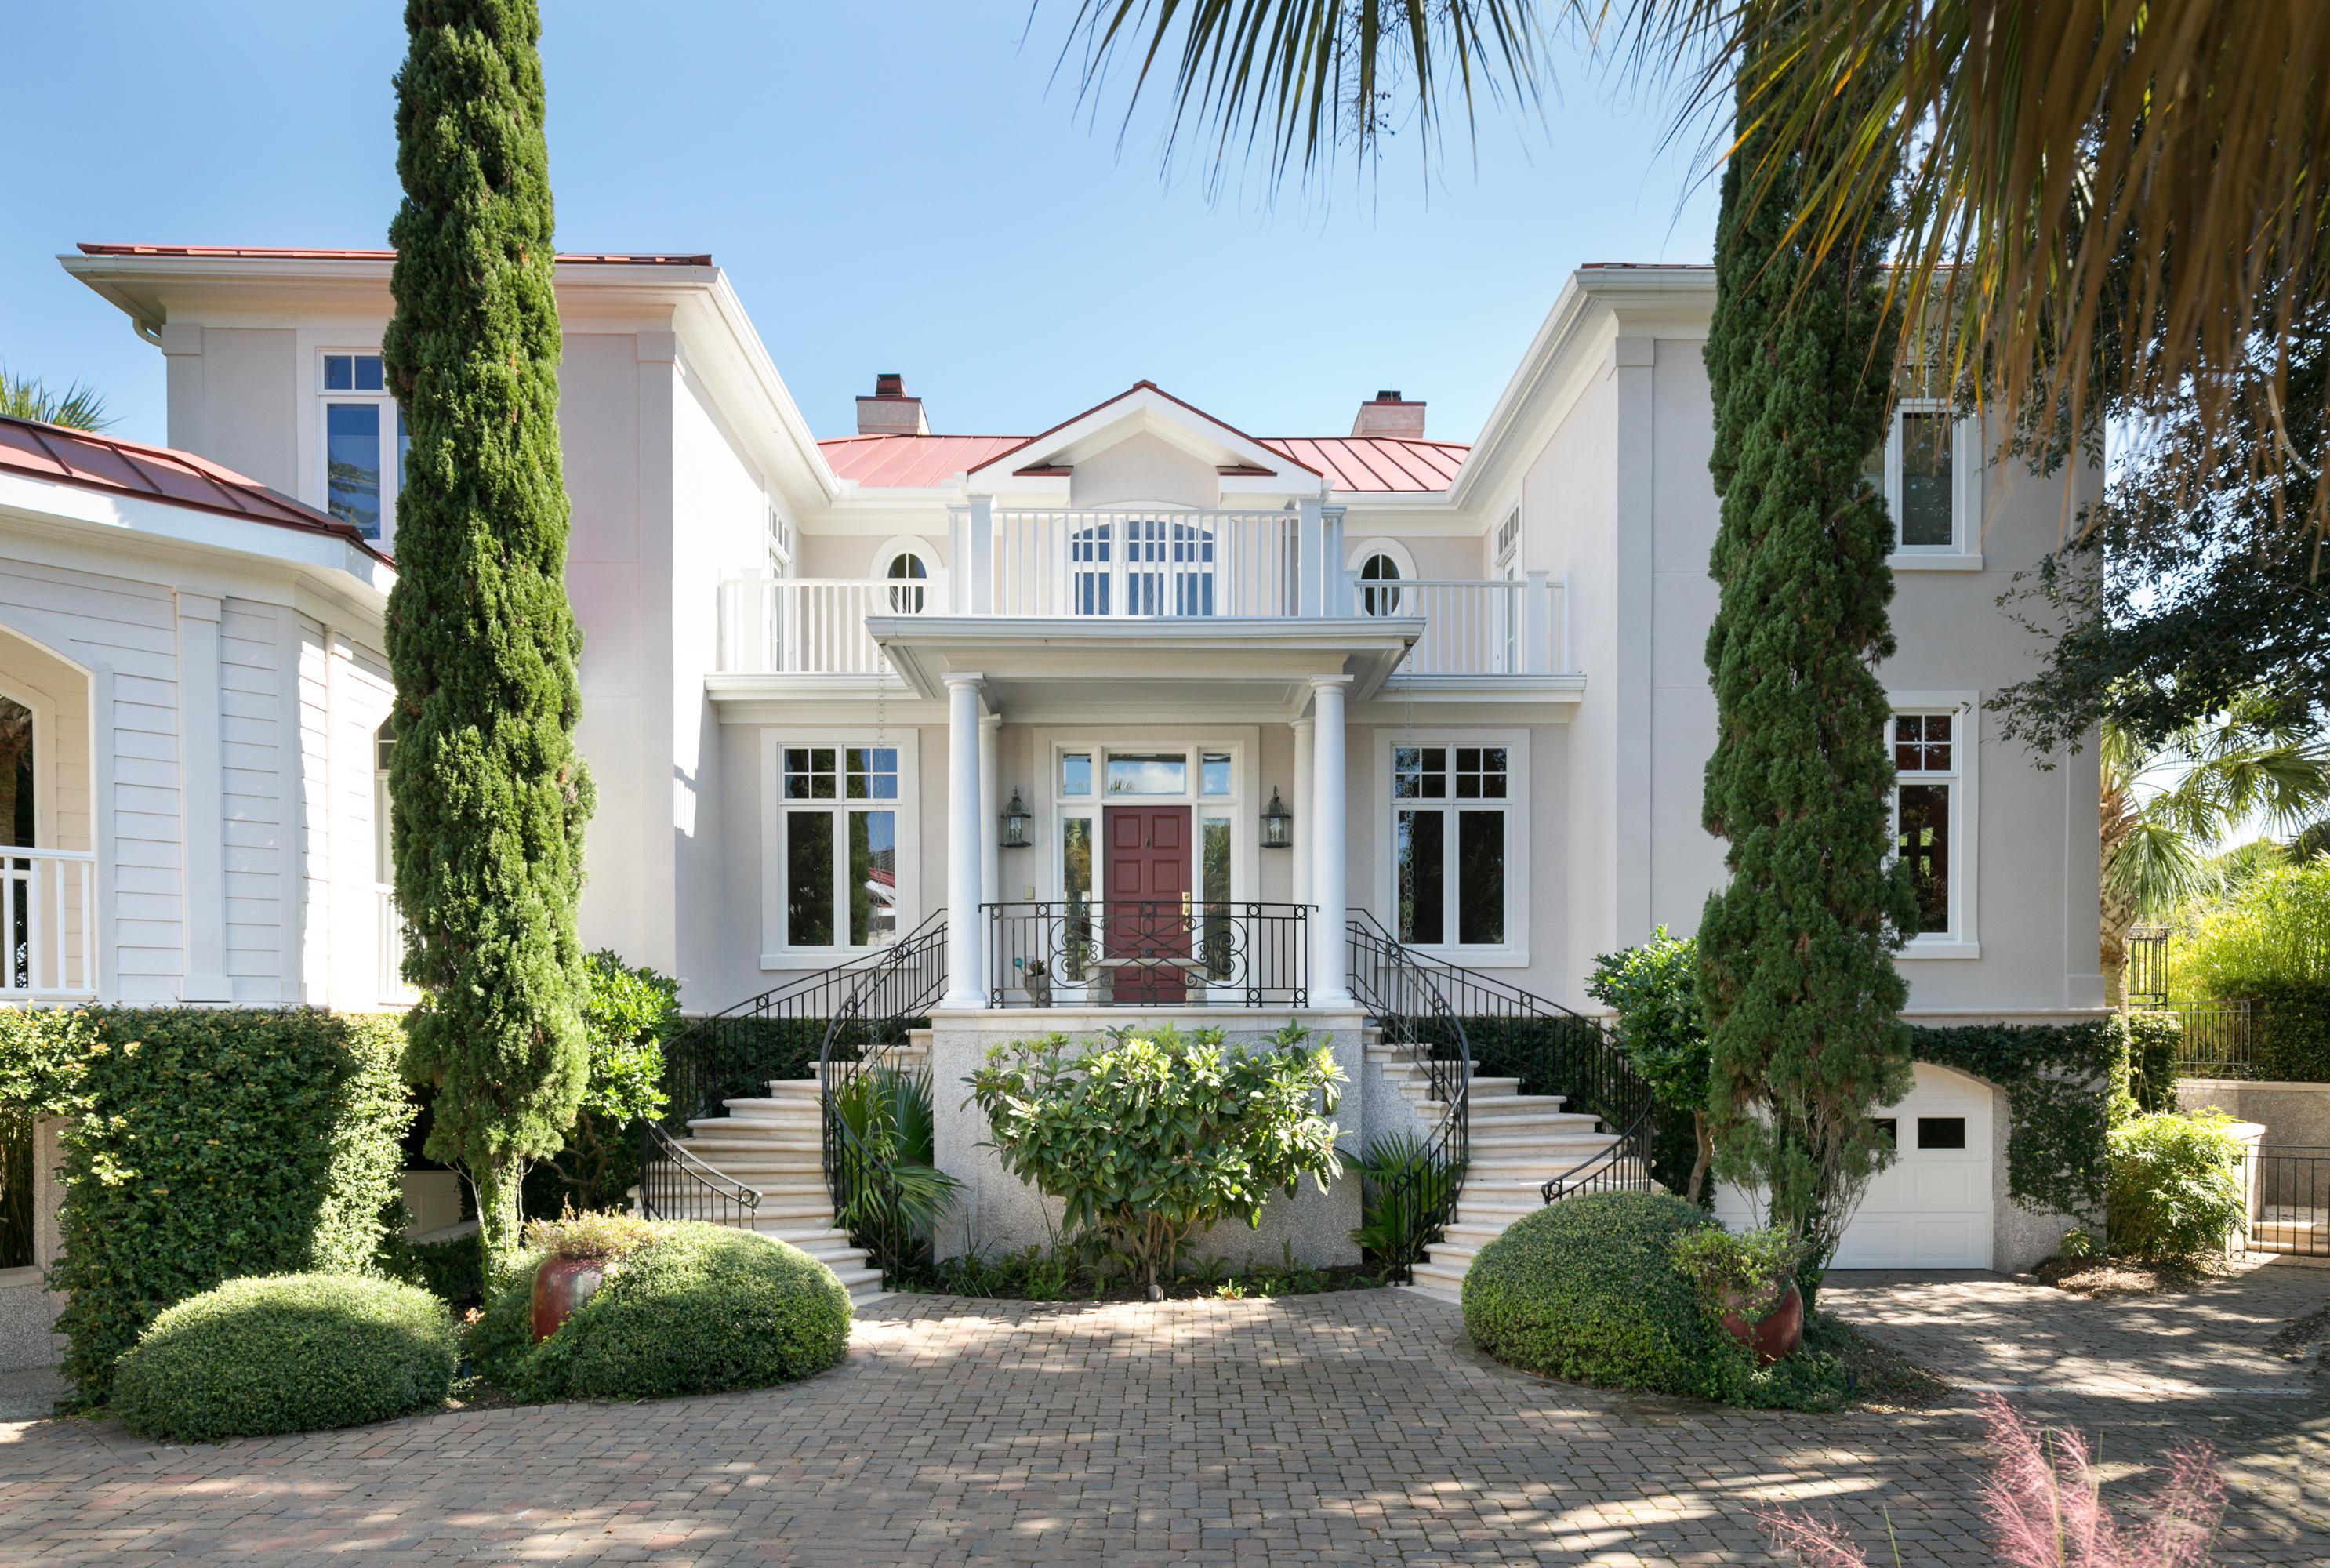 Ocean Forest Homes For Sale - 1121 Ocean Forest Lane, Seabrook Island, SC - 61